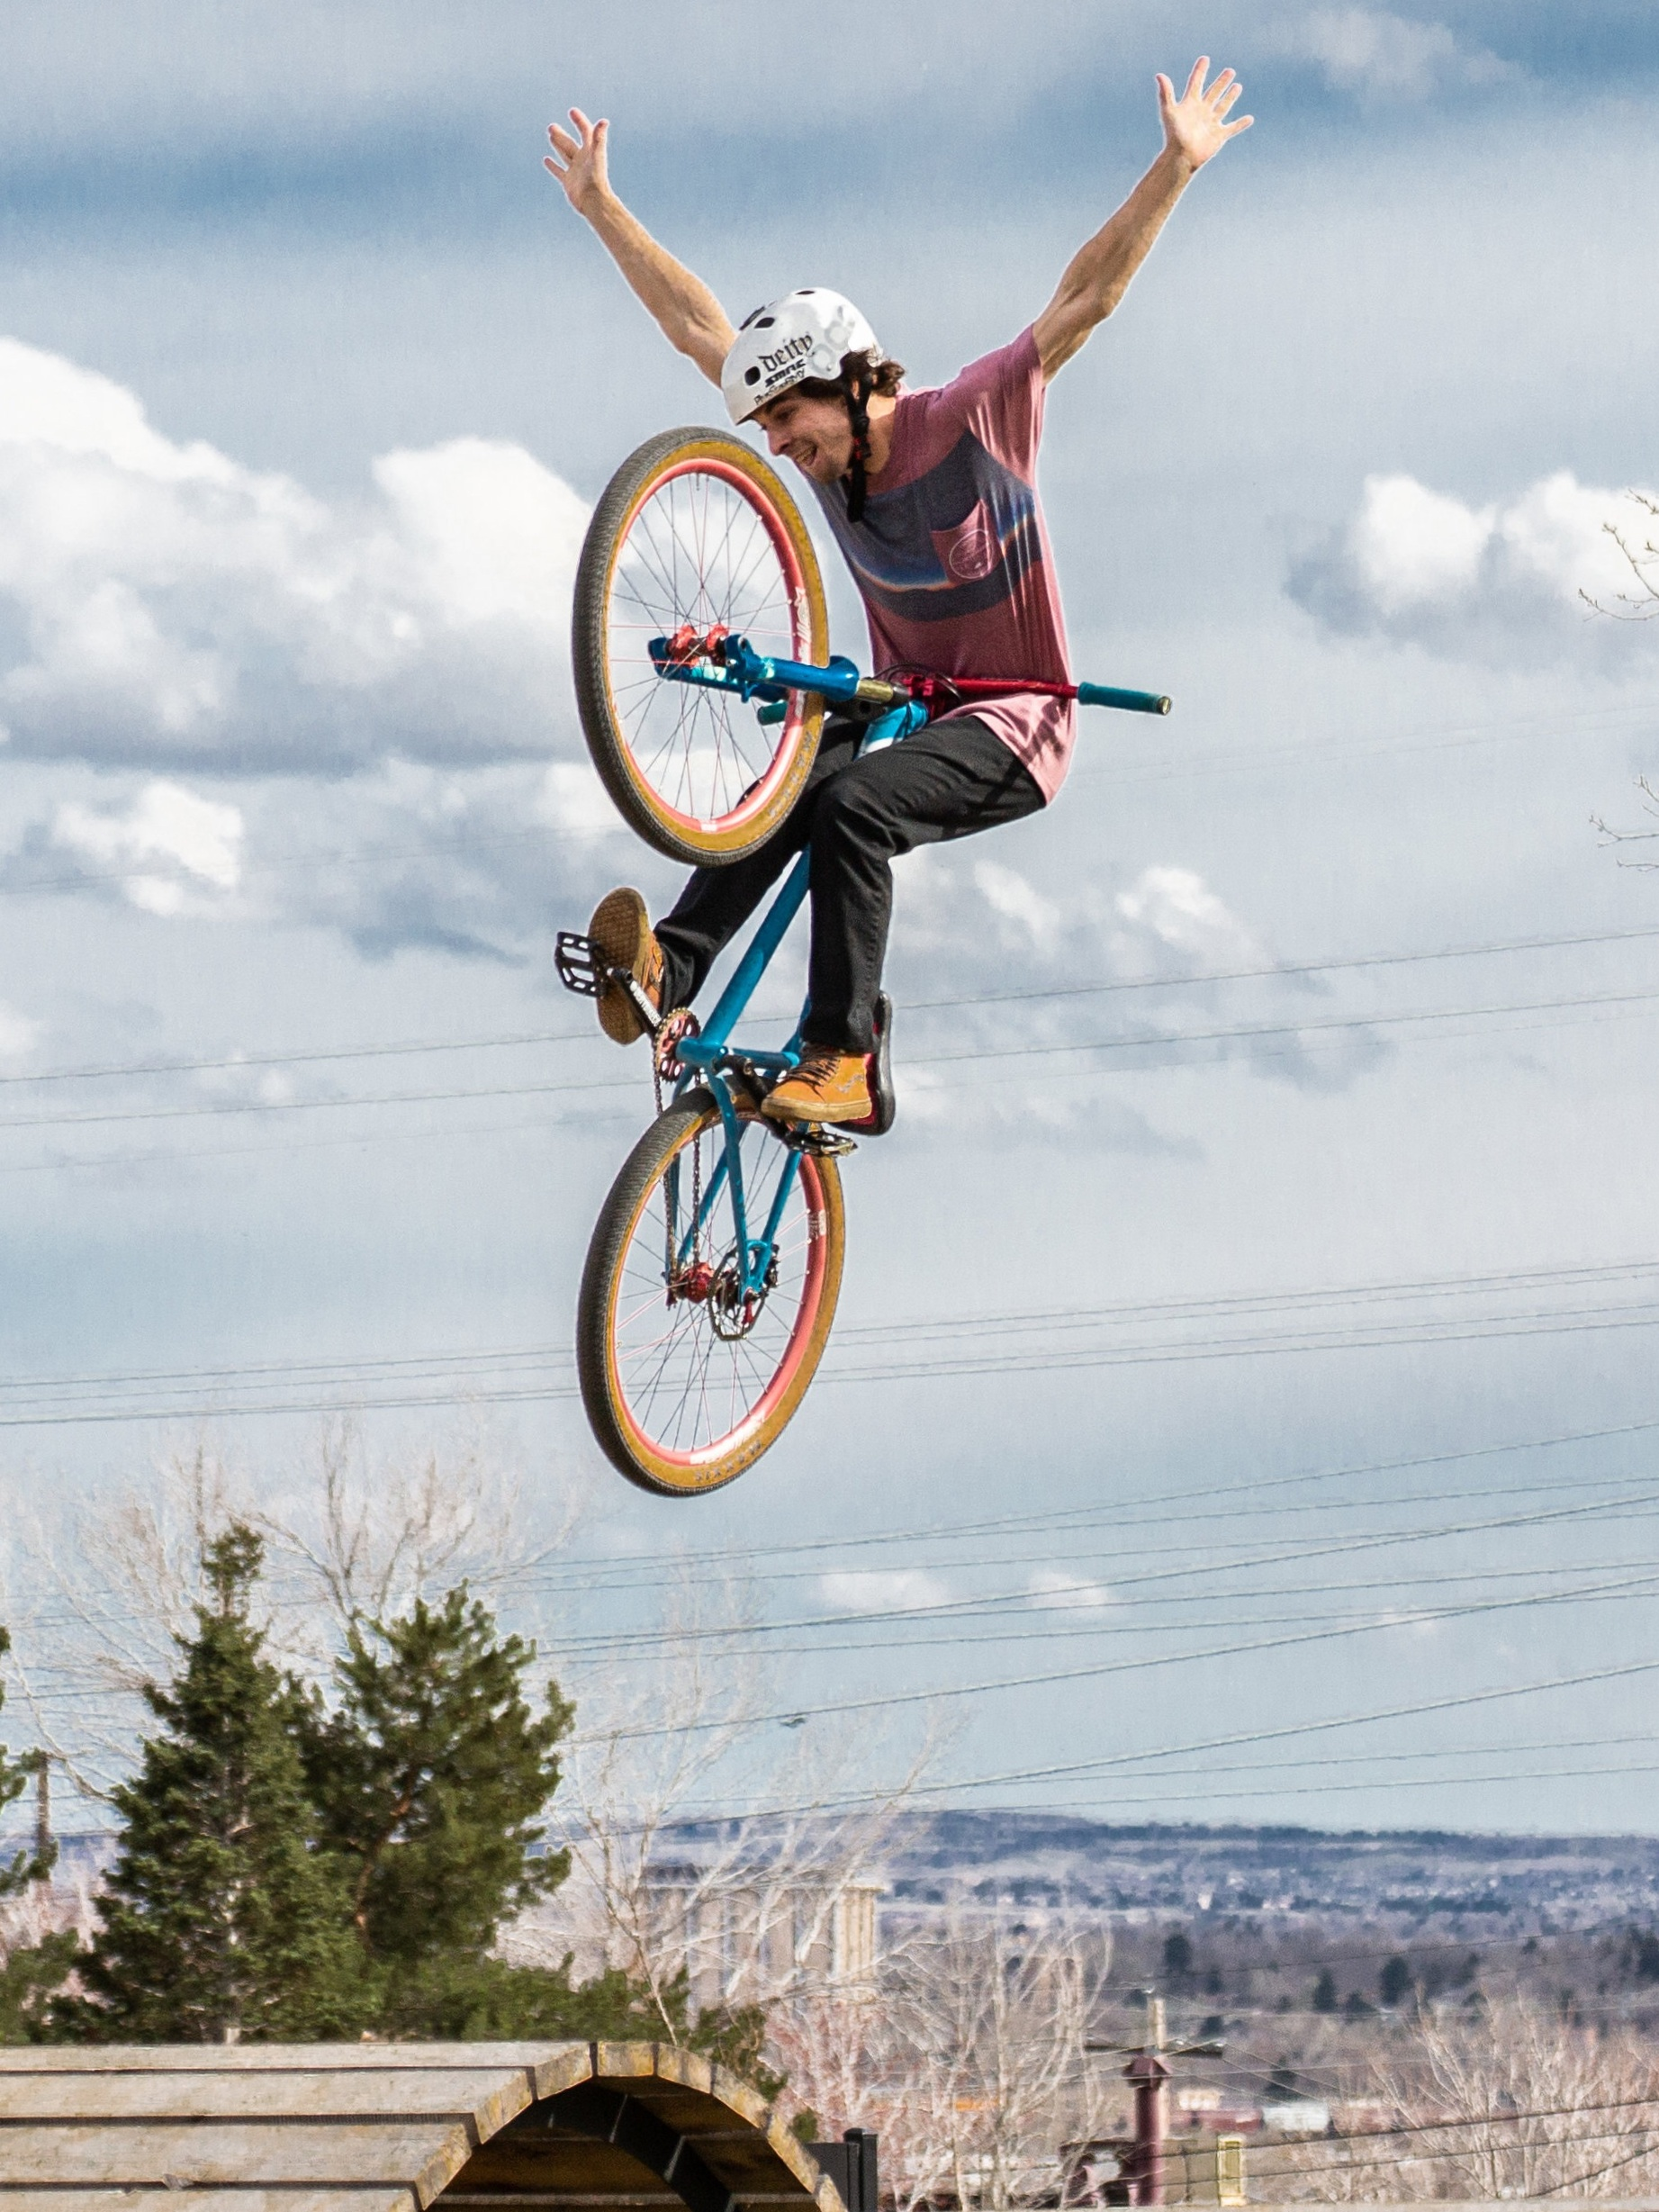 Ruby Hill Bike Park Photo: Leland Schmidt